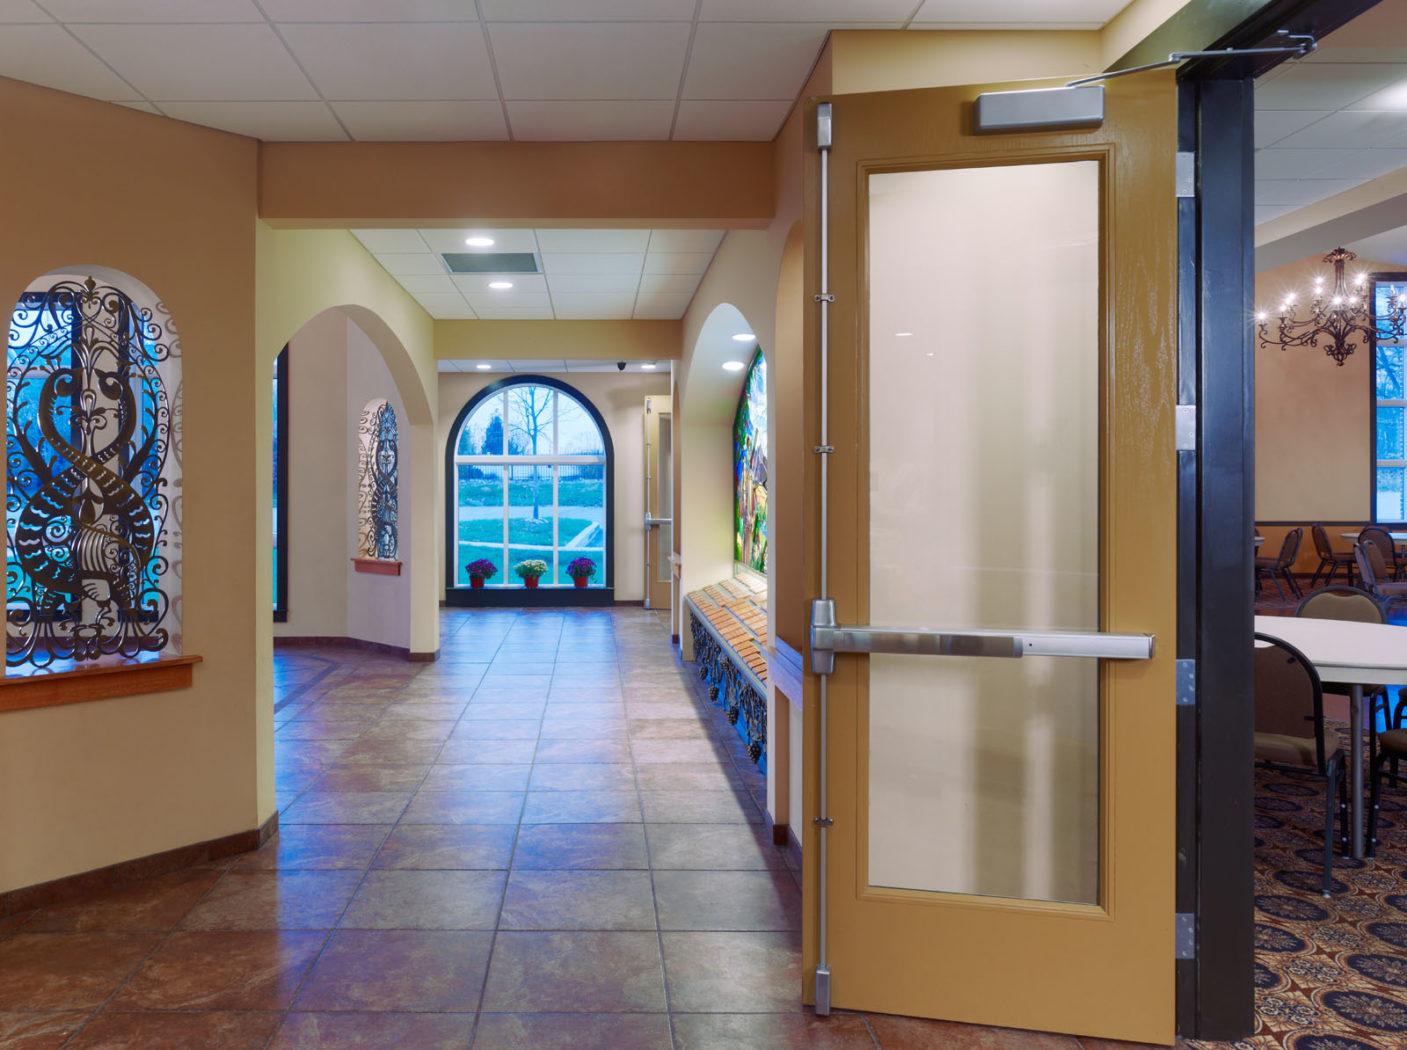 st_greg's_hallway_a